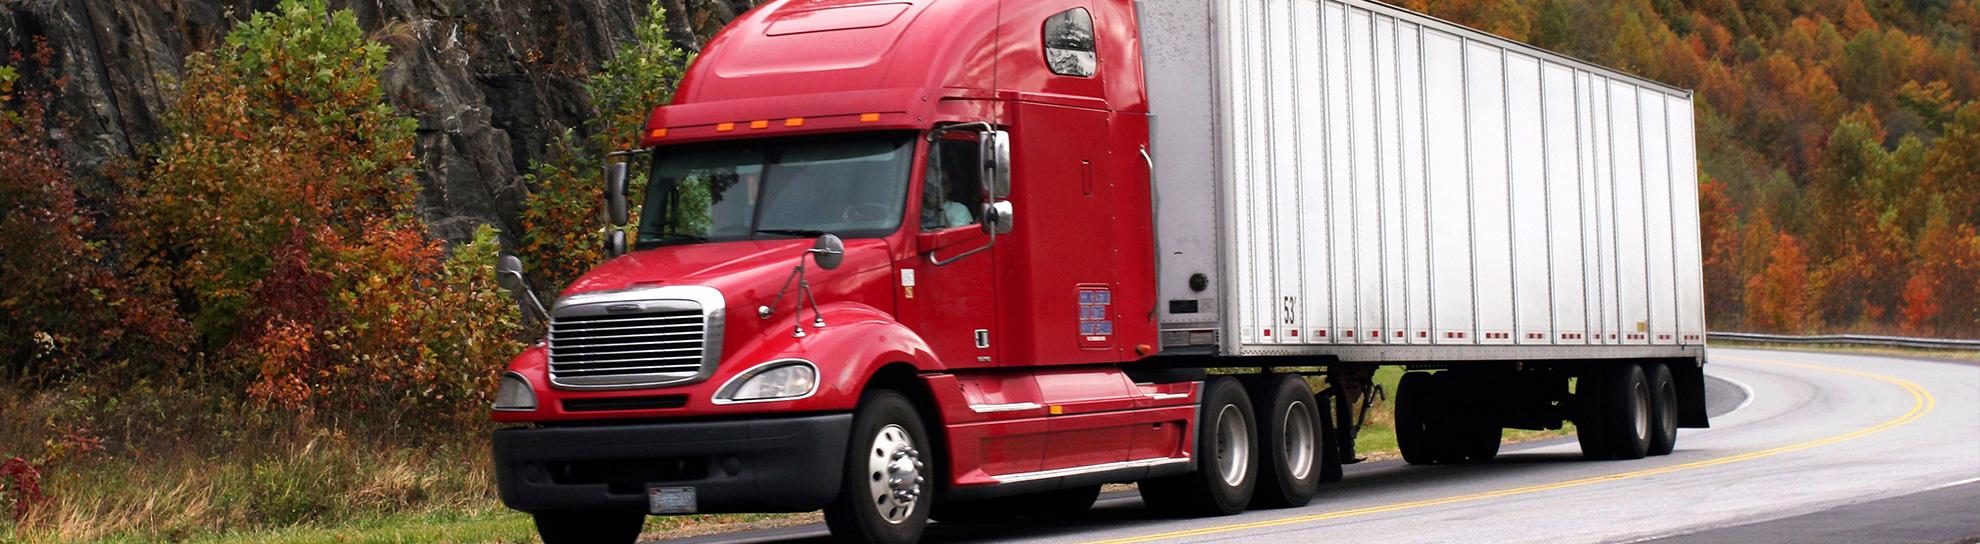 Oregon Department Of Transportation   Commercial Driver